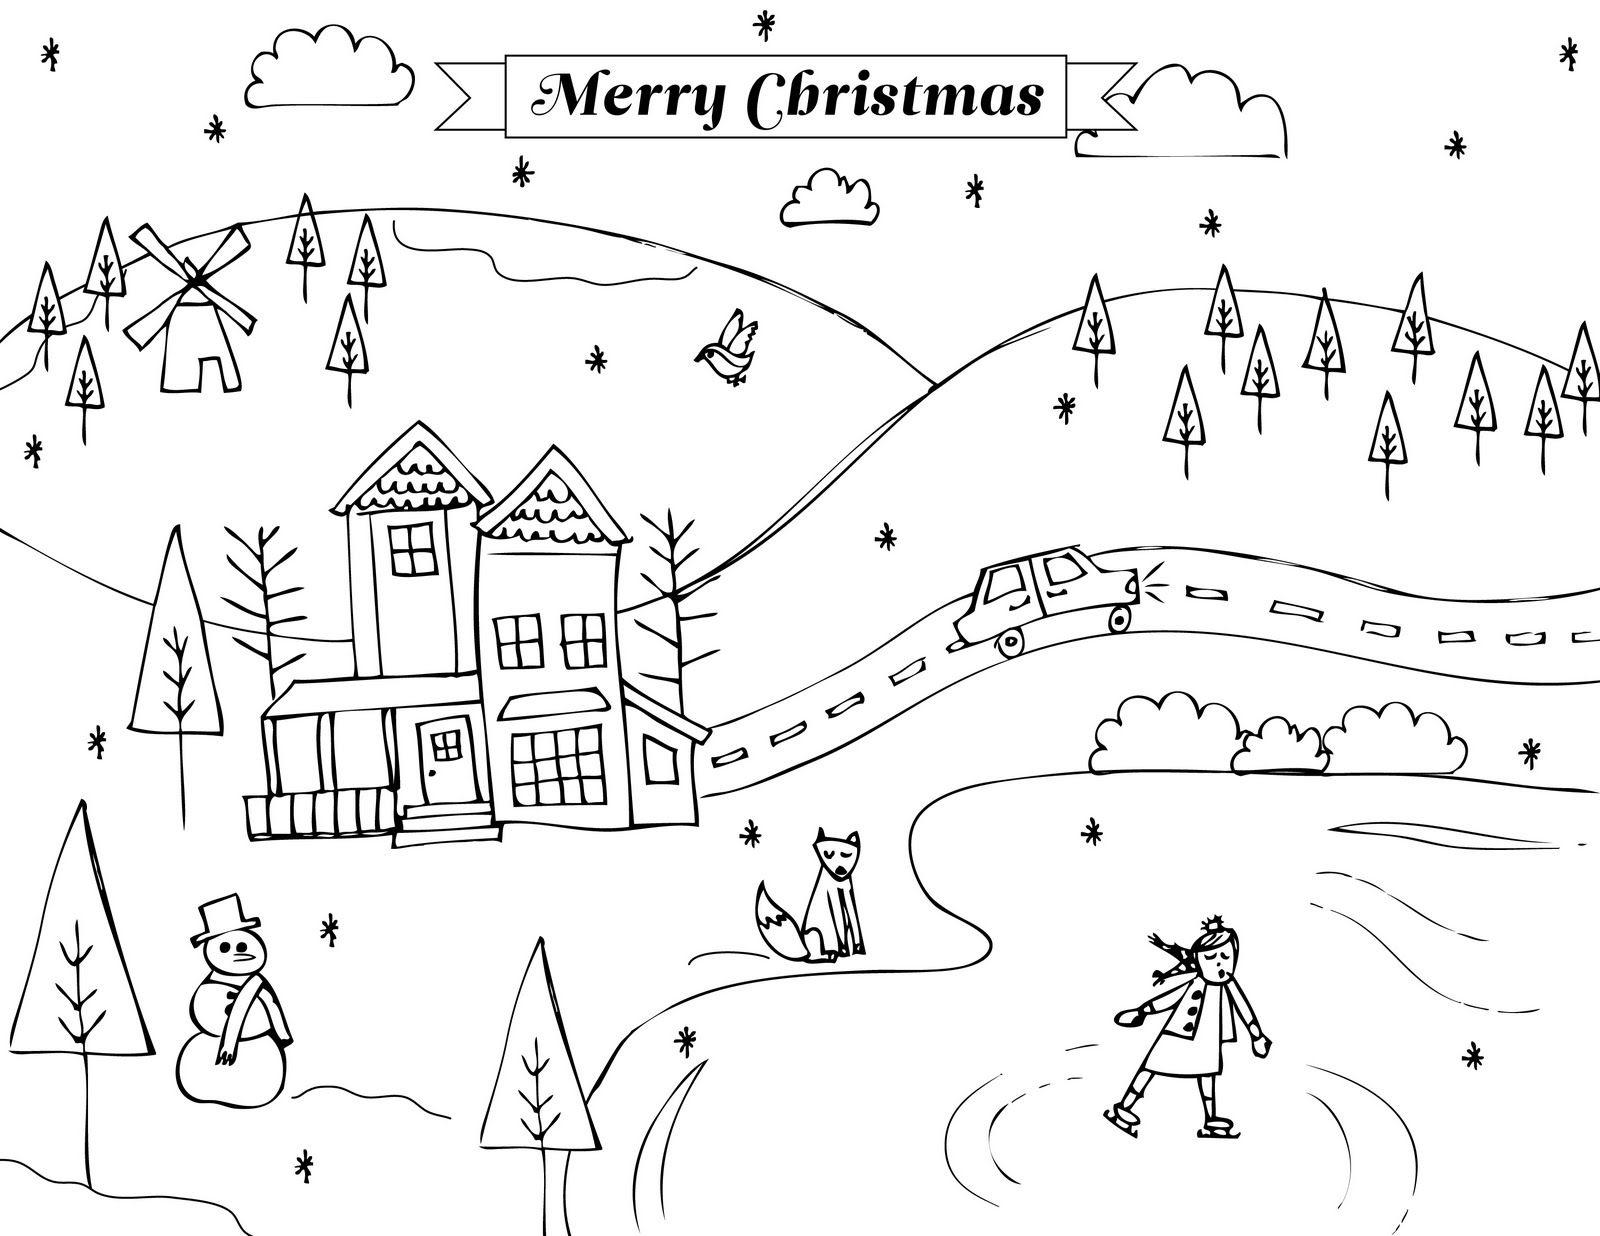 free holiday printable coloring page jpg file from Sharon Rowan